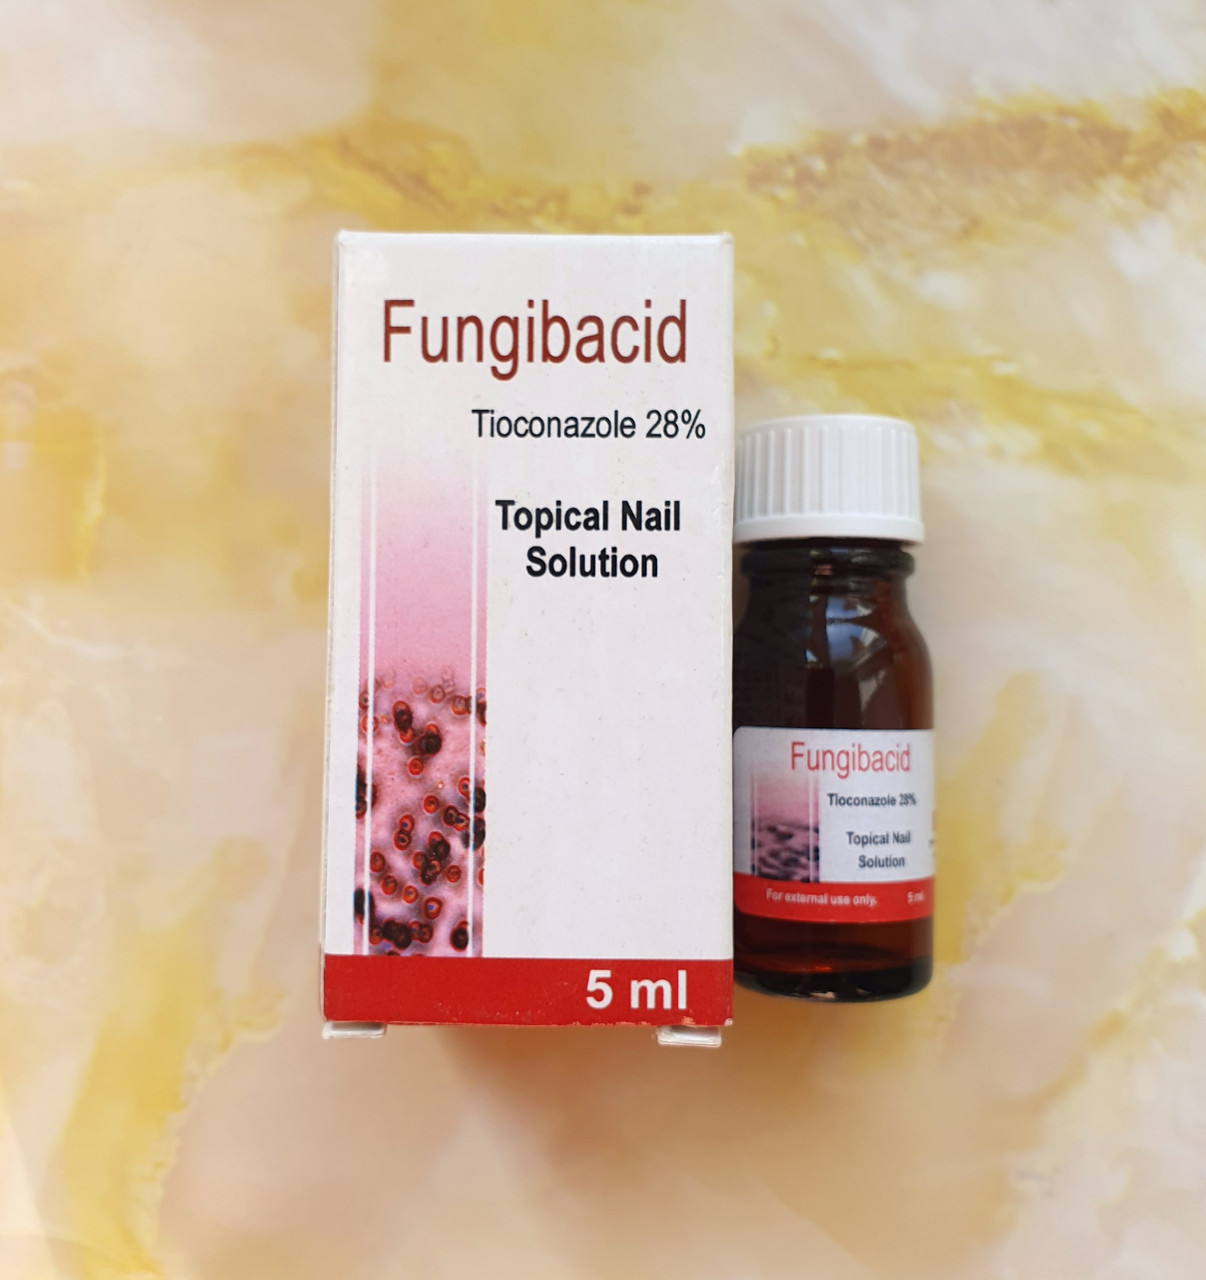 Фунгибацид Fungibacid 5 мл от грибка Египет